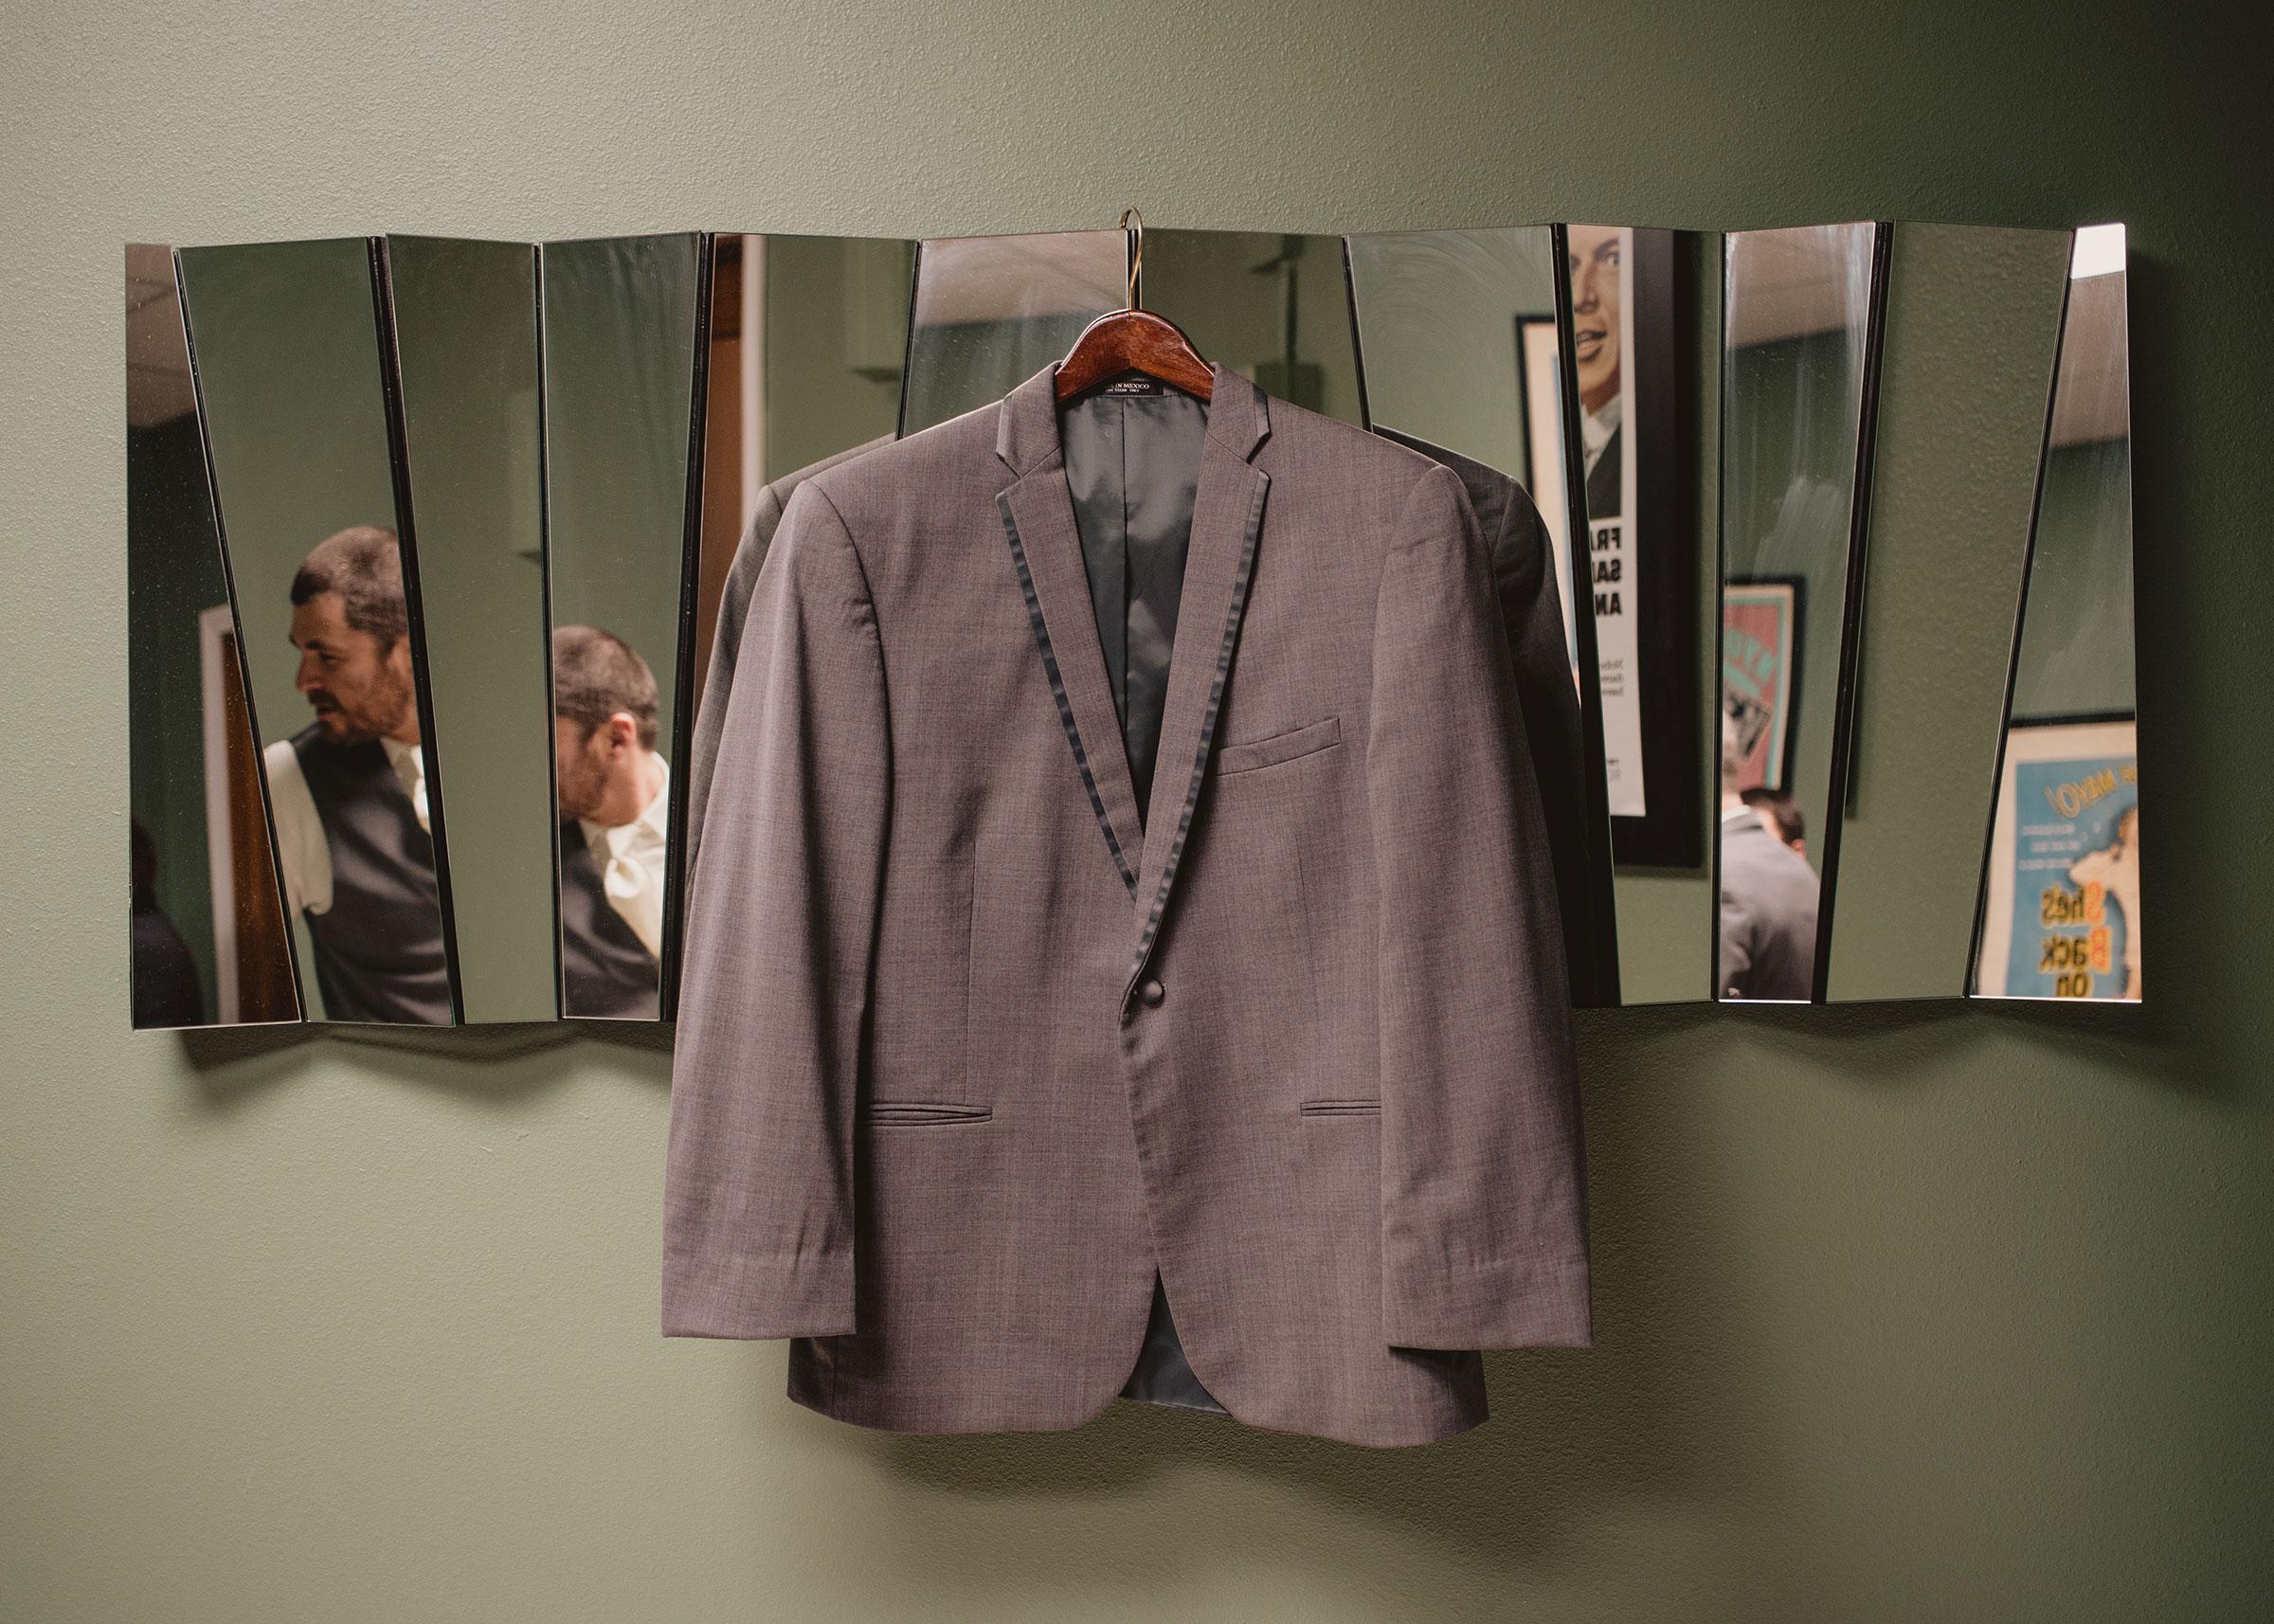 groom-jacket-hanging-on-mirror-decades-event-center-building-desmoines-iowa-raelyn-ramey-photography..jpg